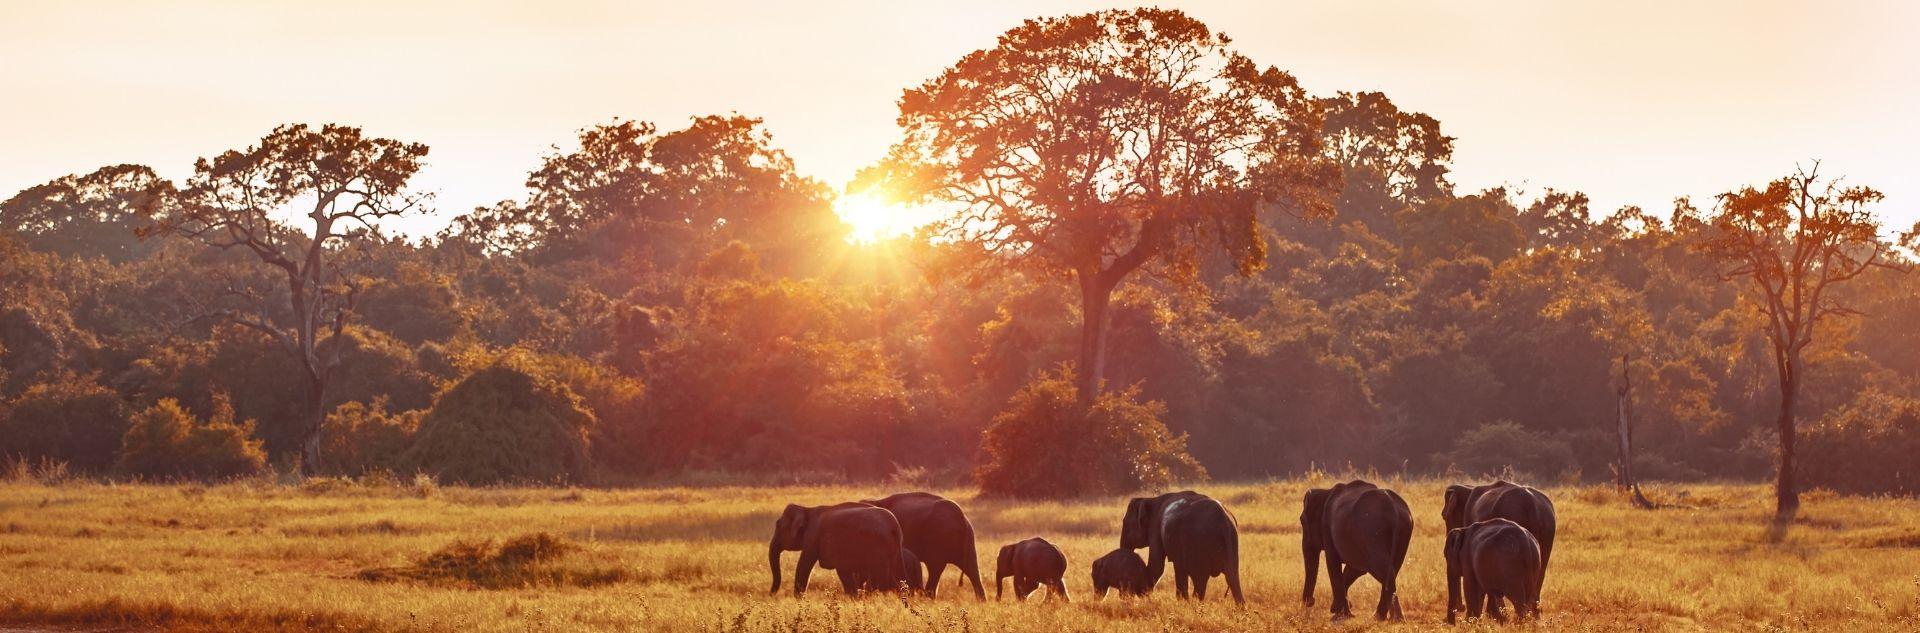 Elefanten in der Natur